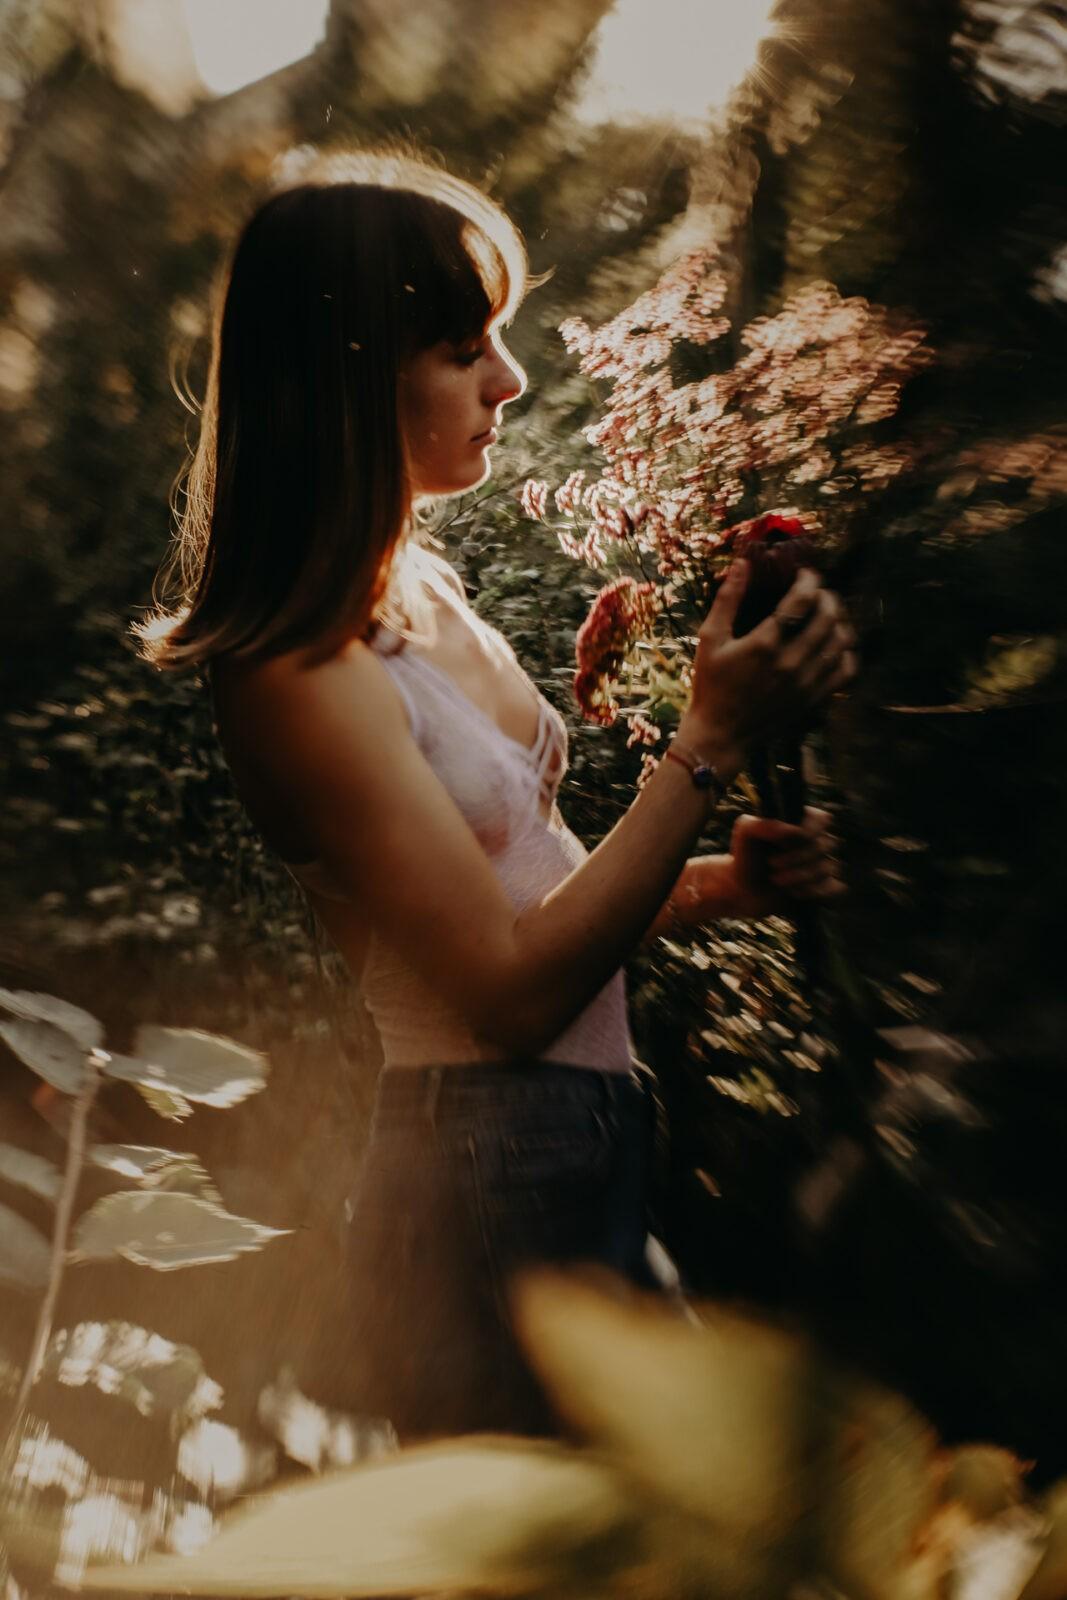 portraits photographe marseille aix en provence avignon maelys izzo